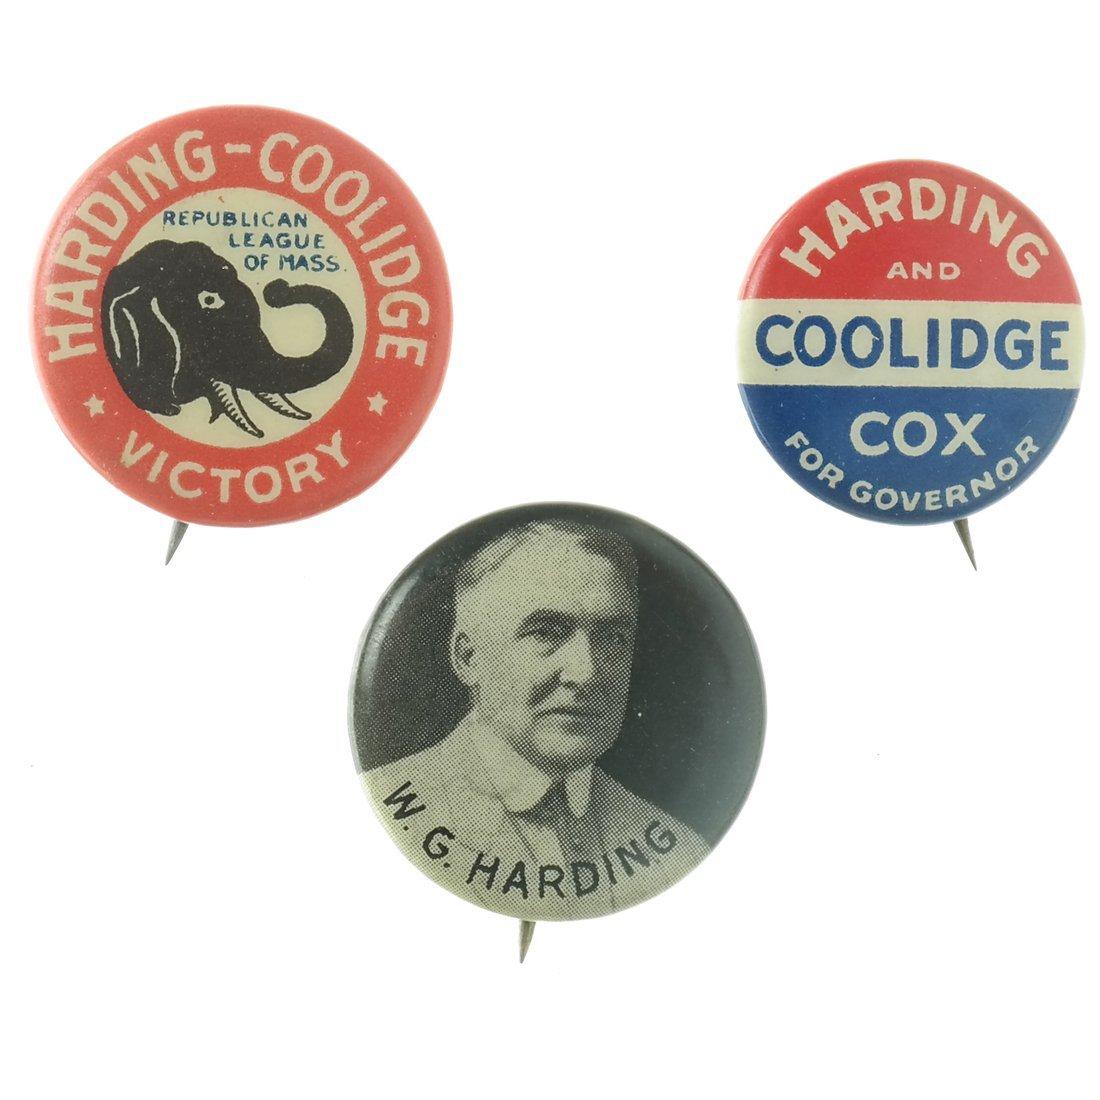 Harding & Coolidge - Three 1920 Celluloids